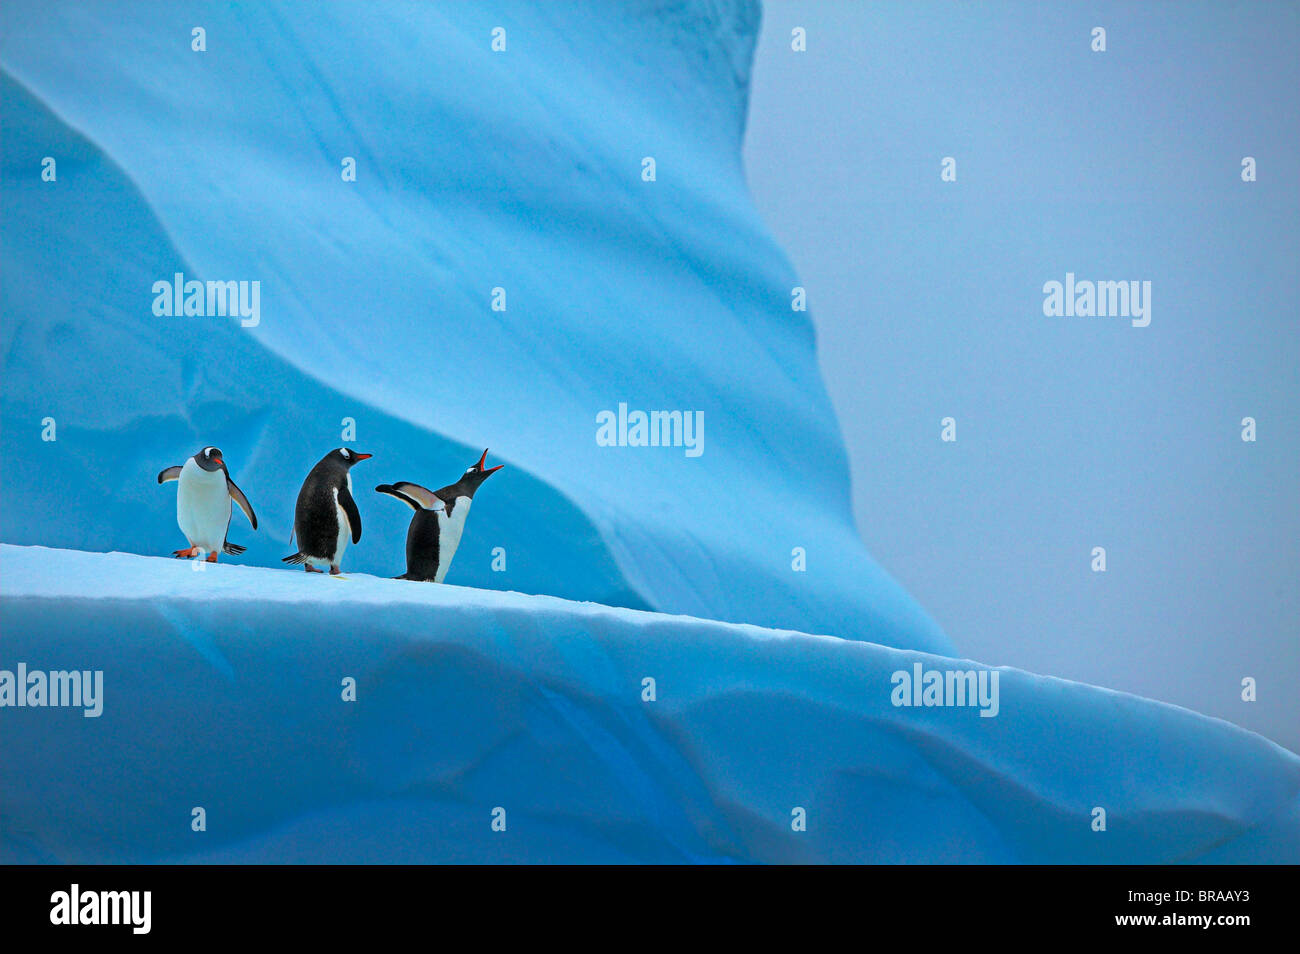 Gentoo penguin (Pygoscelis papua) group on iceberg, Mikkelsen Harbour, Antarctica - Stock Image